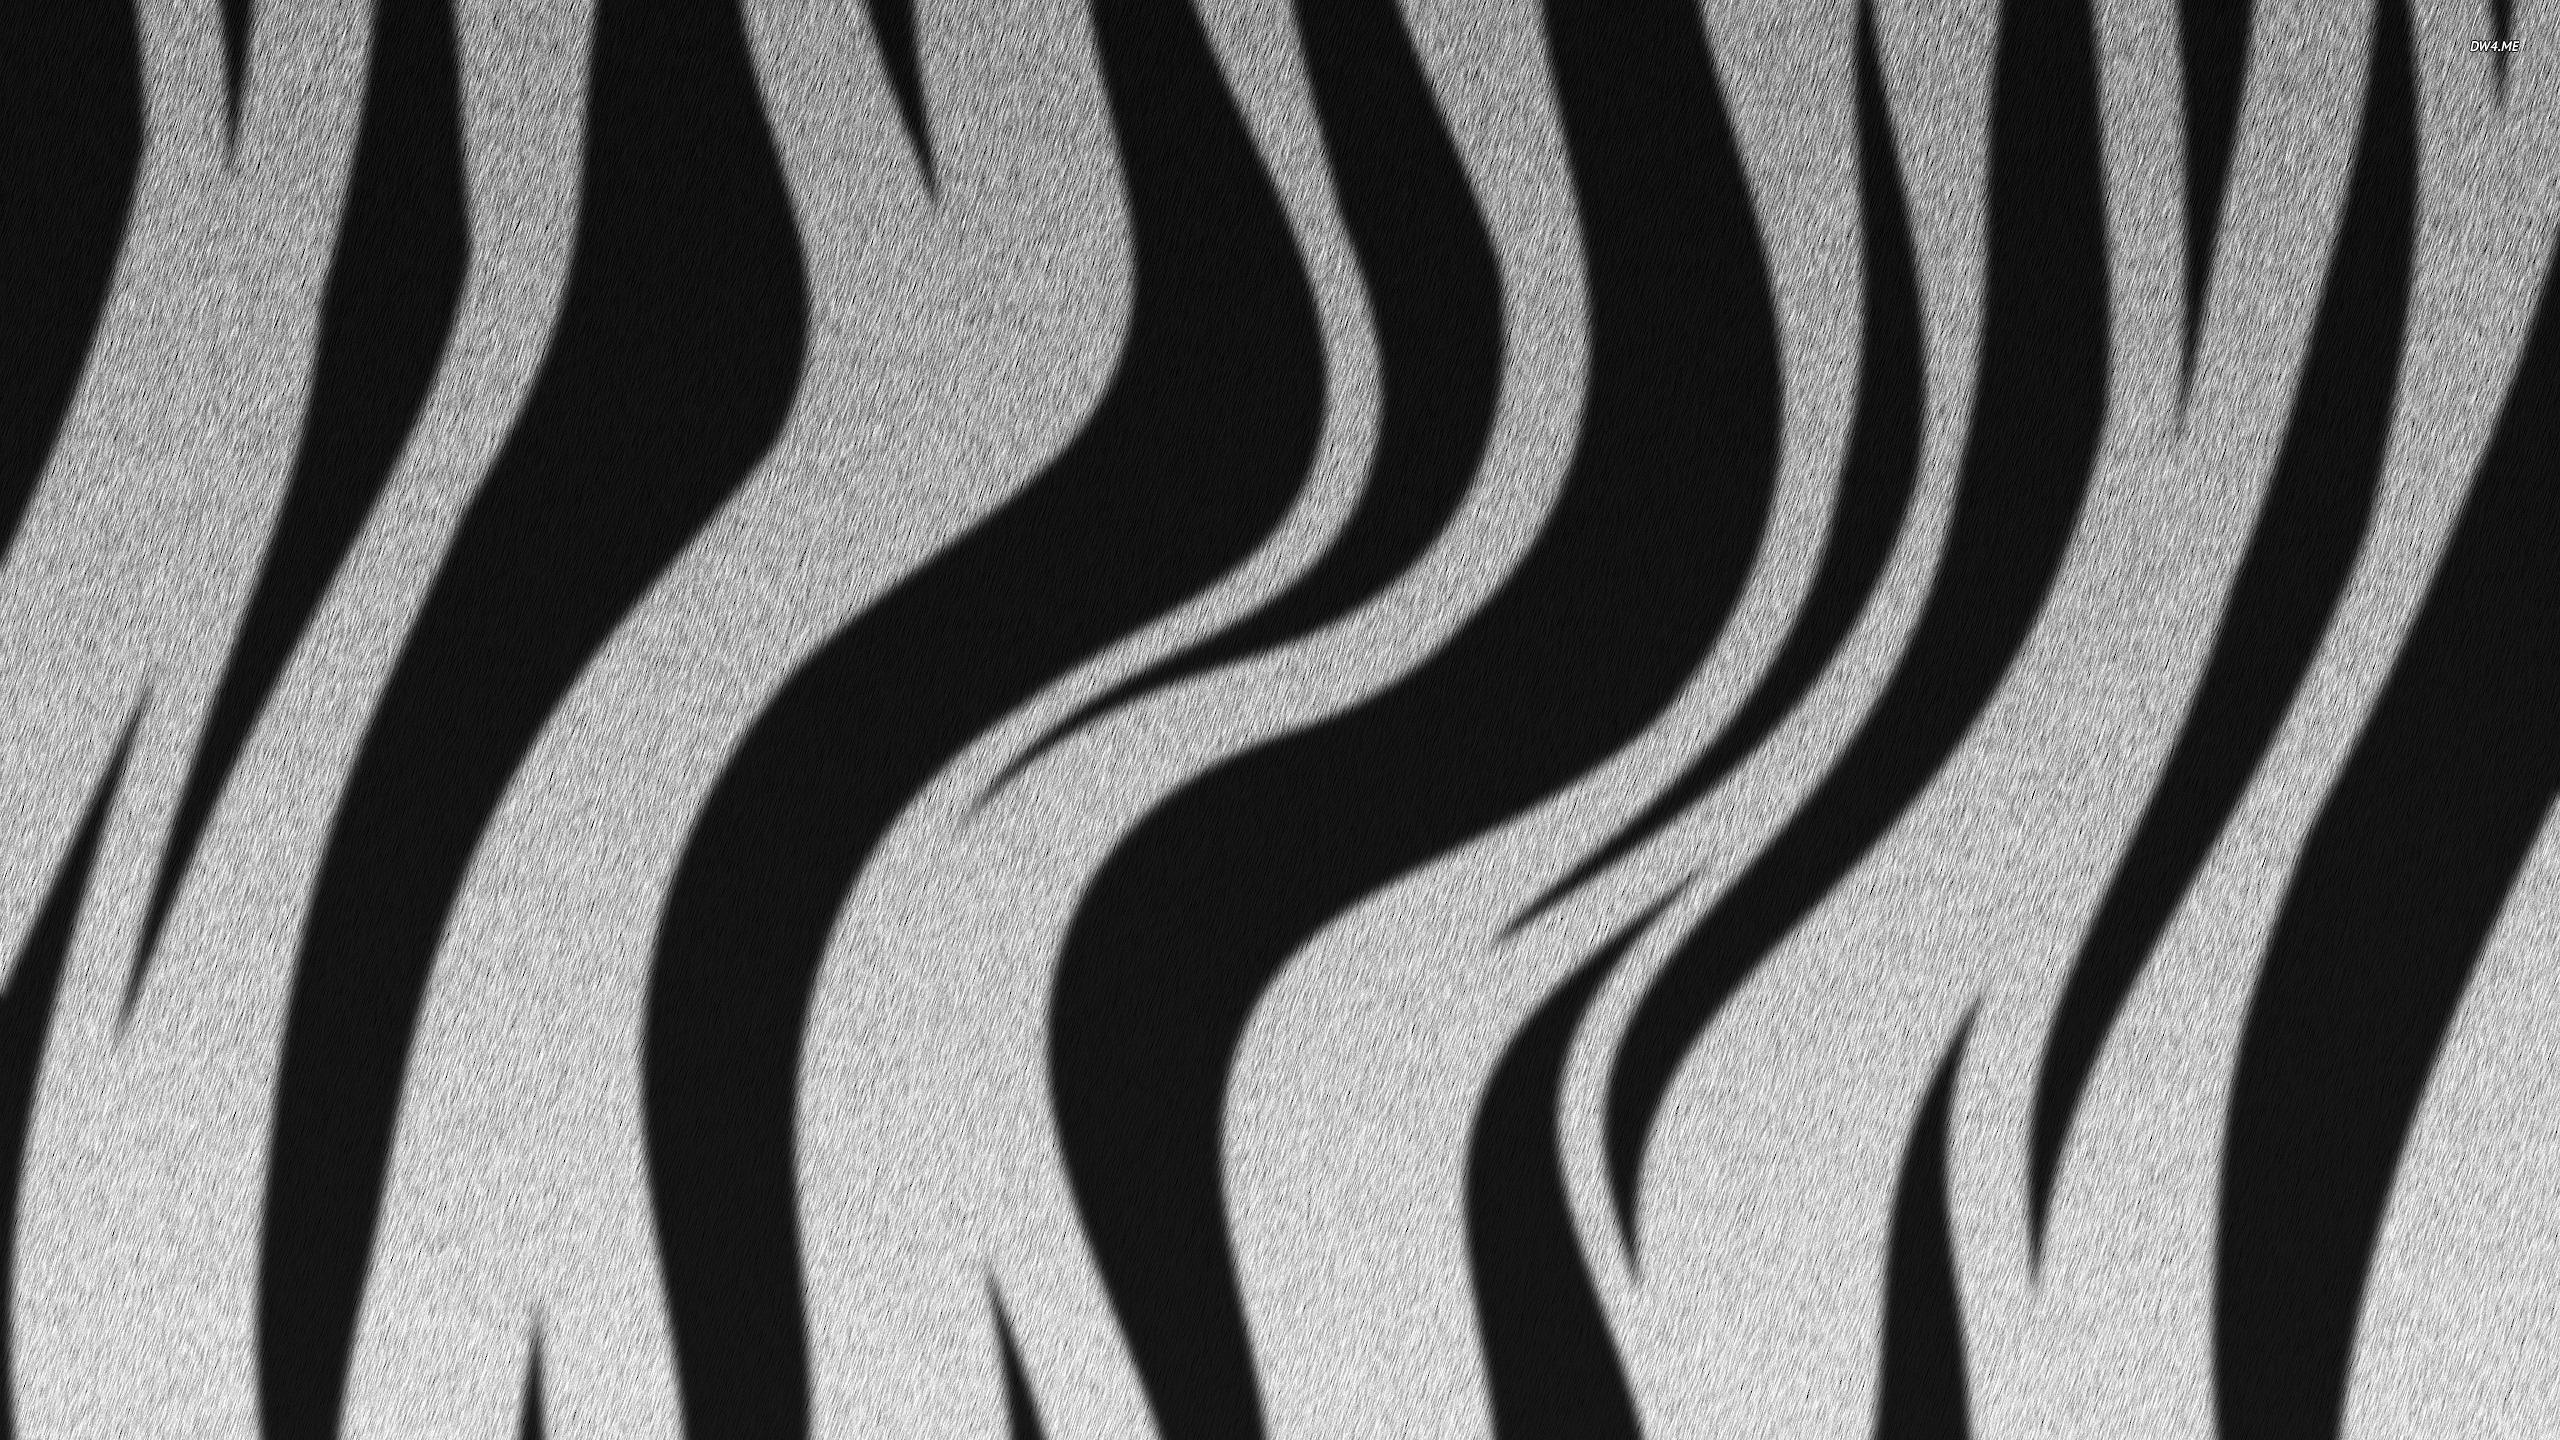 Zebra stripes wallpaper   Digital Art wallpapers   752 2560x1440